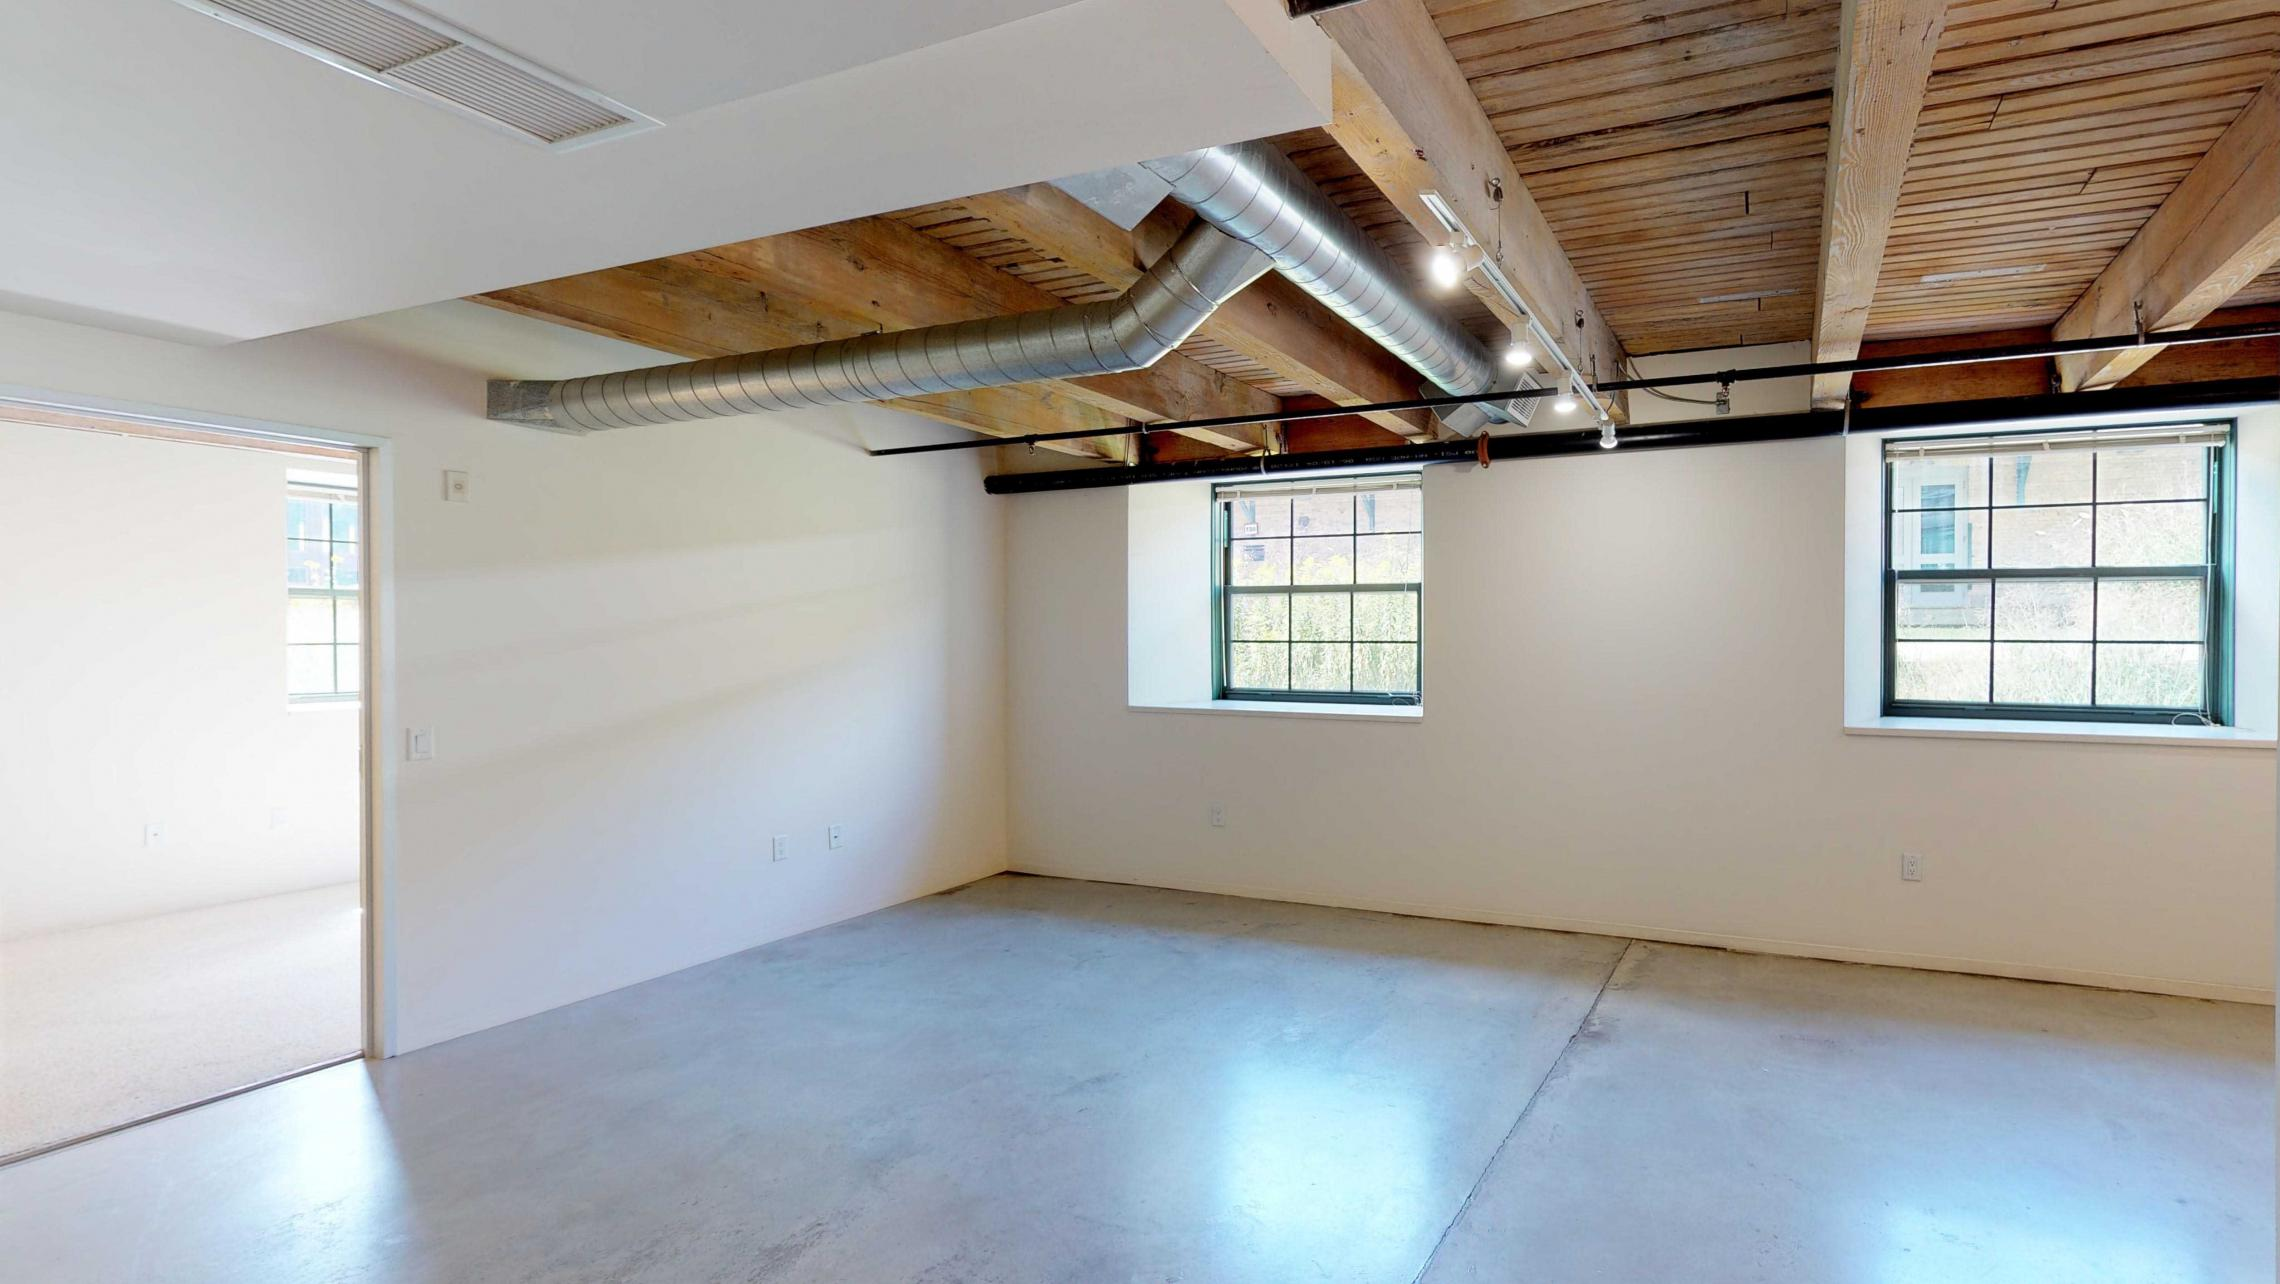 Tobacco-Lofts-Apartment-E102-Design-Historic-Polished-Concrete-Madison-Downtown-modern-upscale-lake-capitol